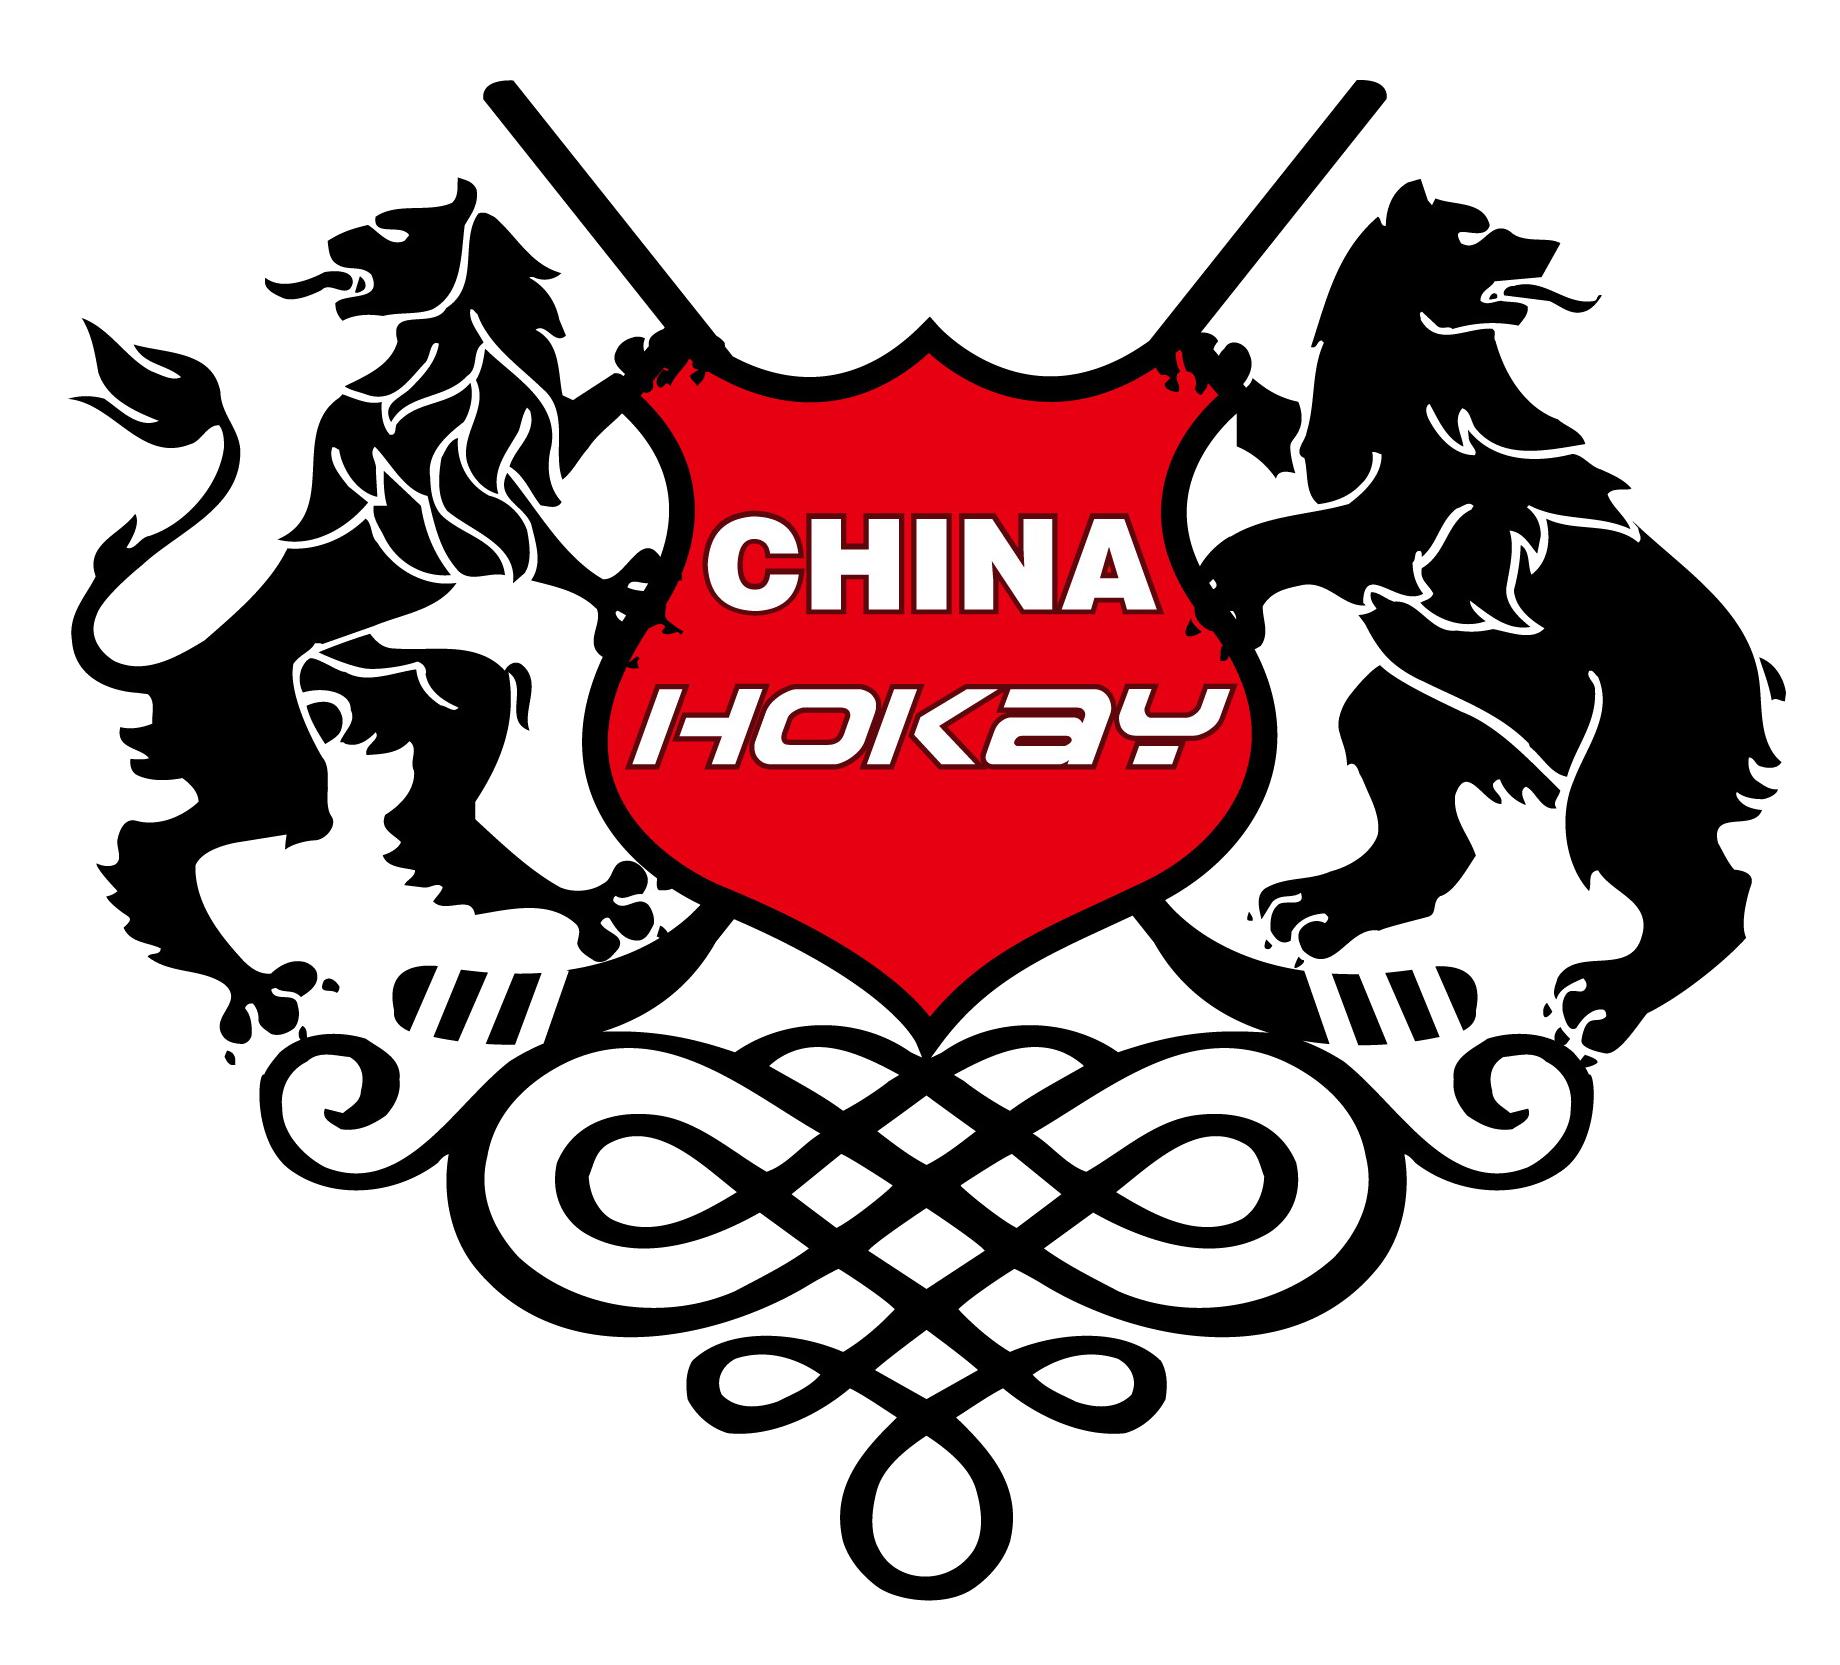 狮子标非注册标识-Hokay-China-logo.png